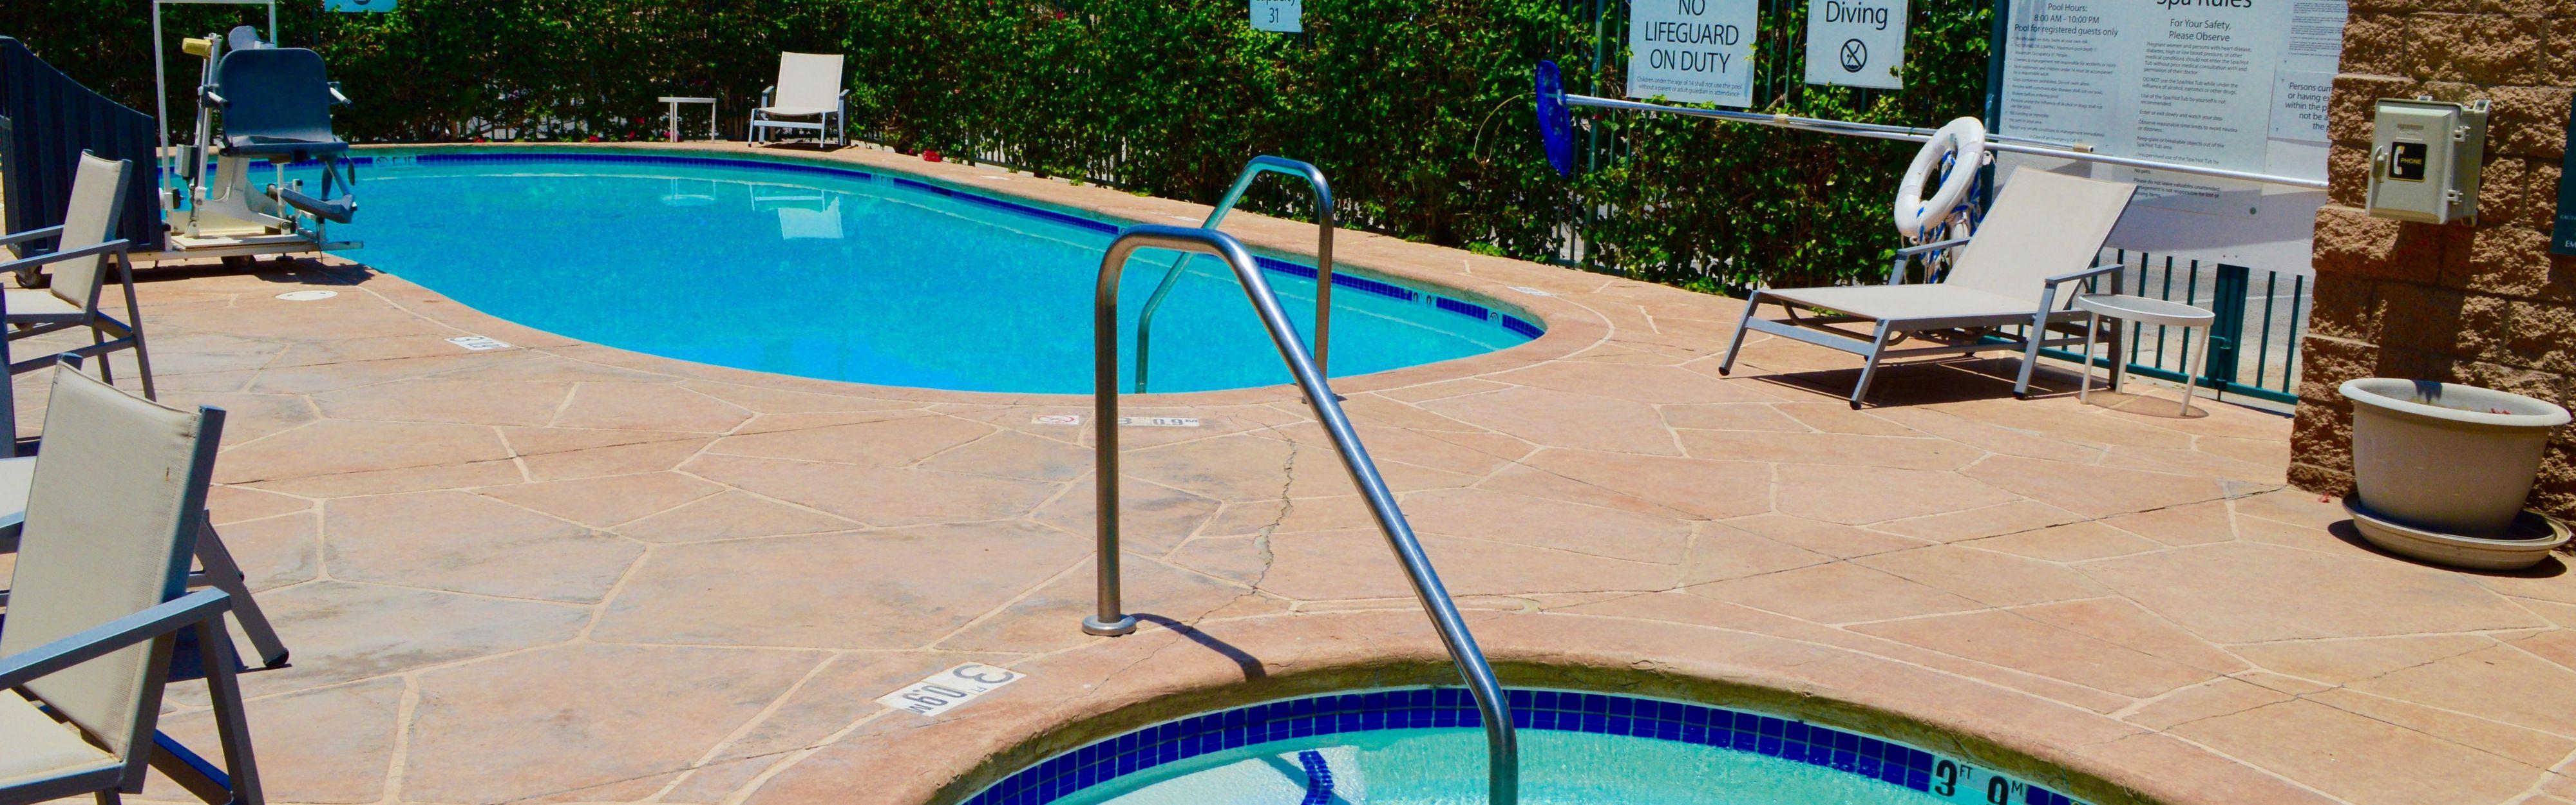 Holiday Inn Express Calexico image 2